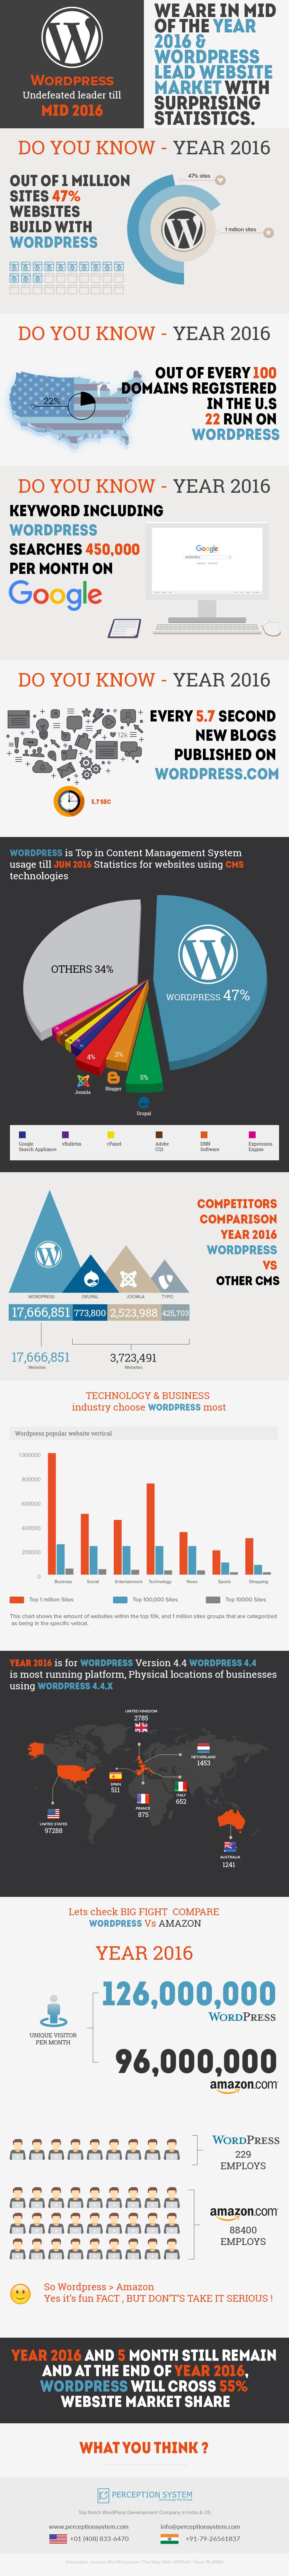 WordPress: estadísticas sorprendentes #infografia #infographic #socialmedia